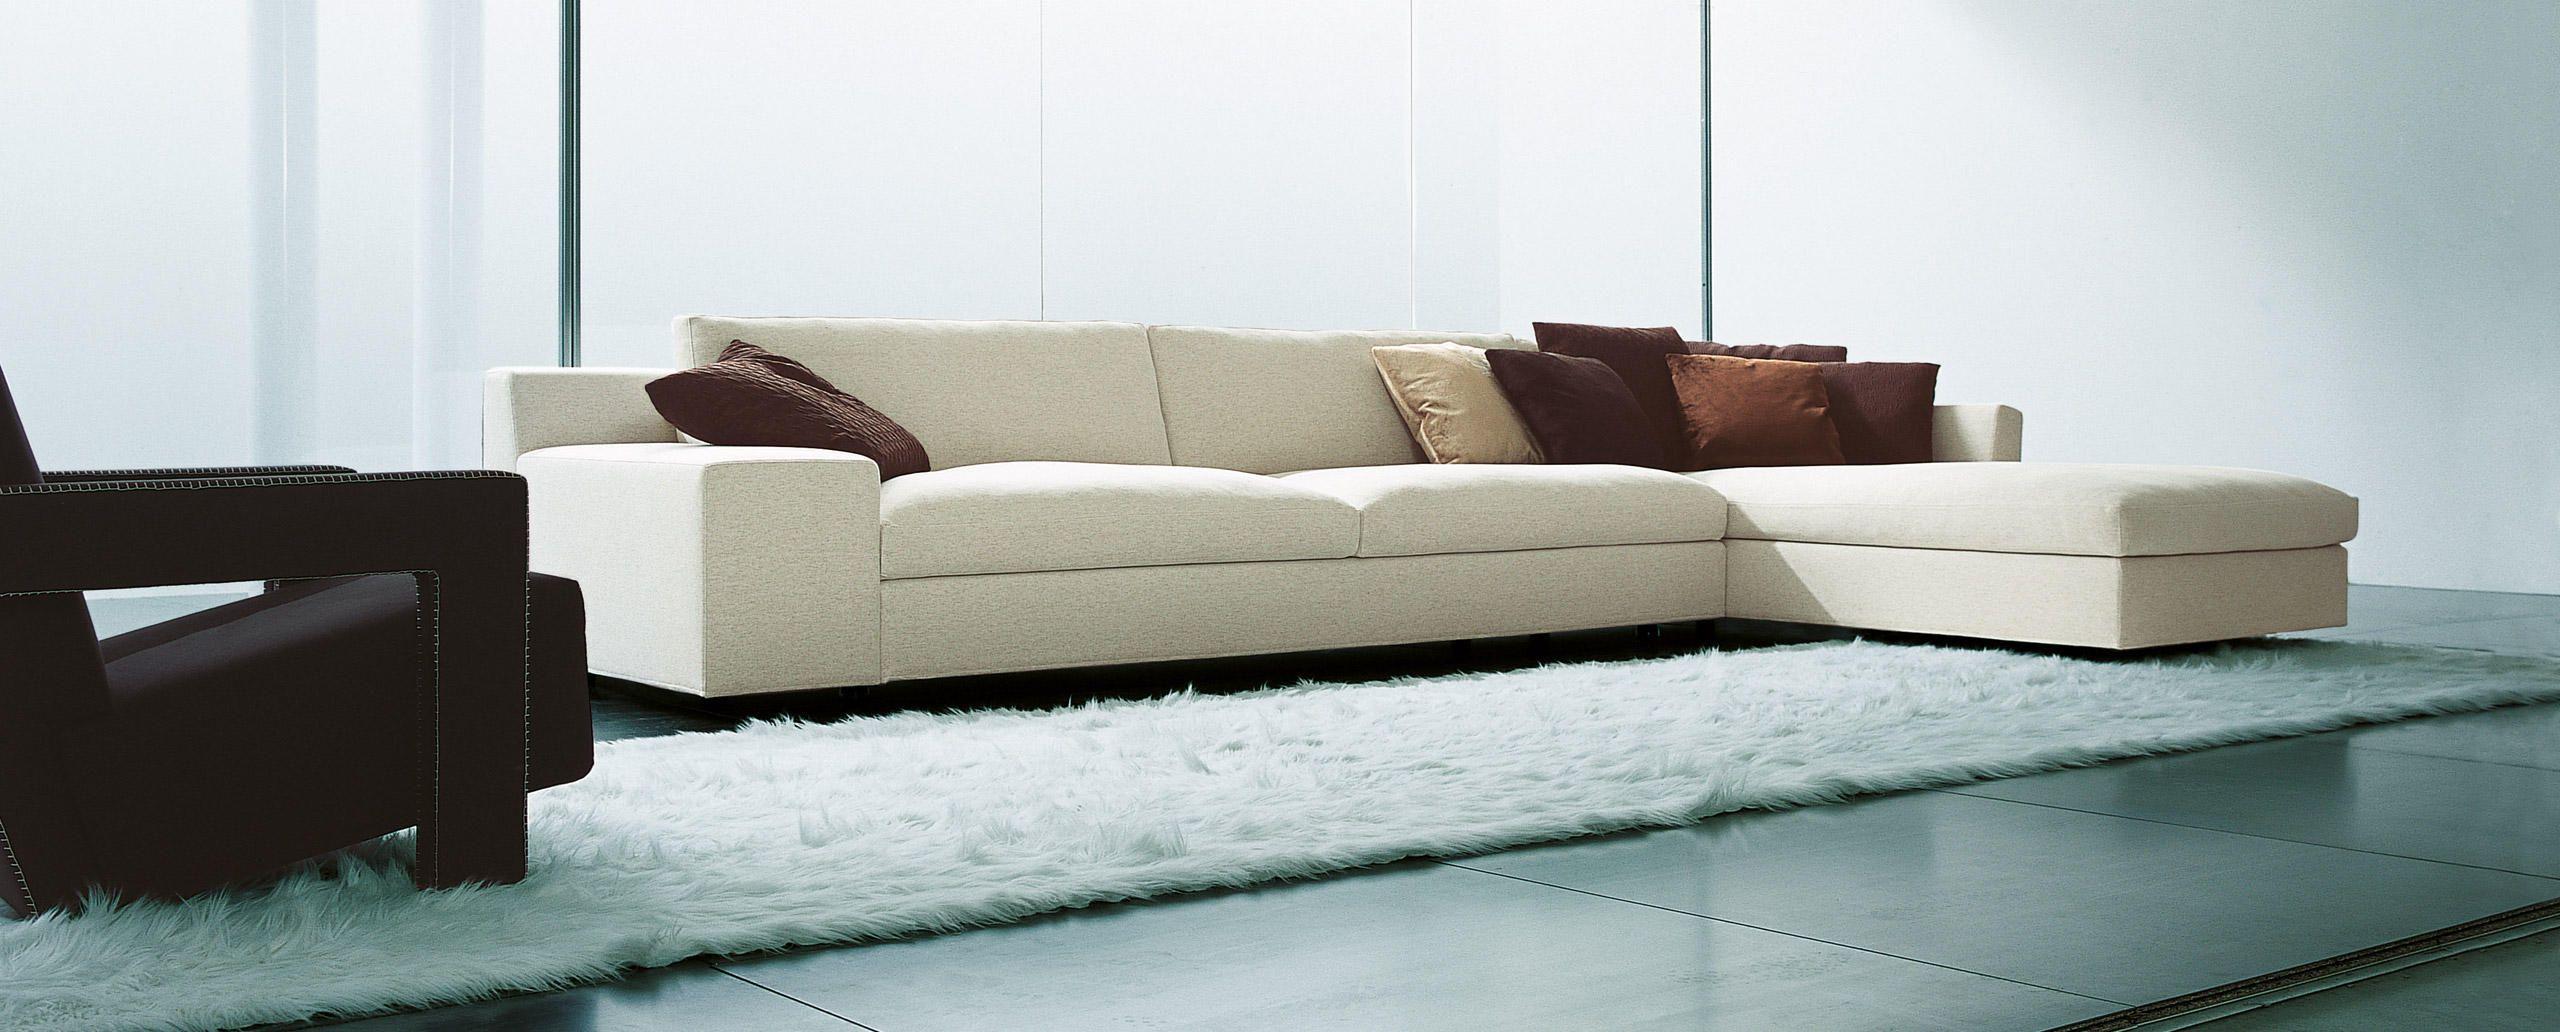 Cassina 235 238 mister sofas sectionals pinterest for Rollandi arredamenti